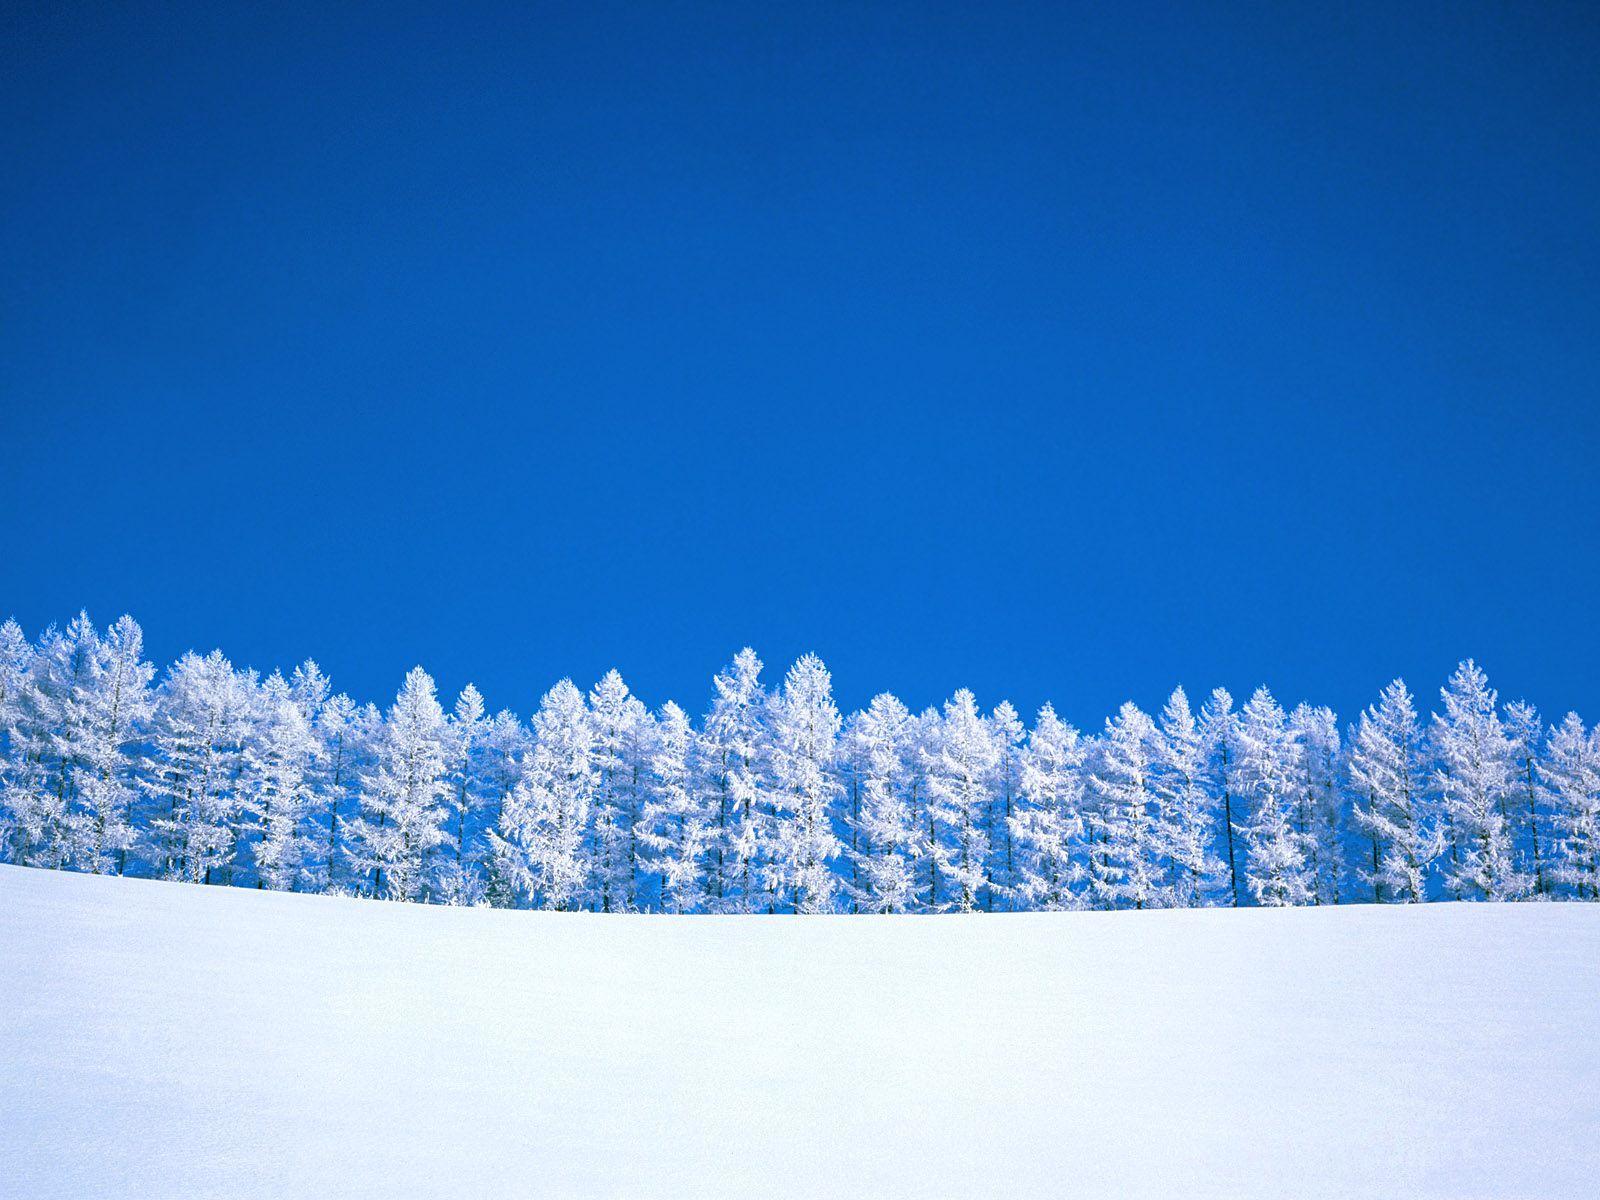 Snowy Ice Mountains Widescreen HD Wallpapers Laptop PC Desktop 1600x1200